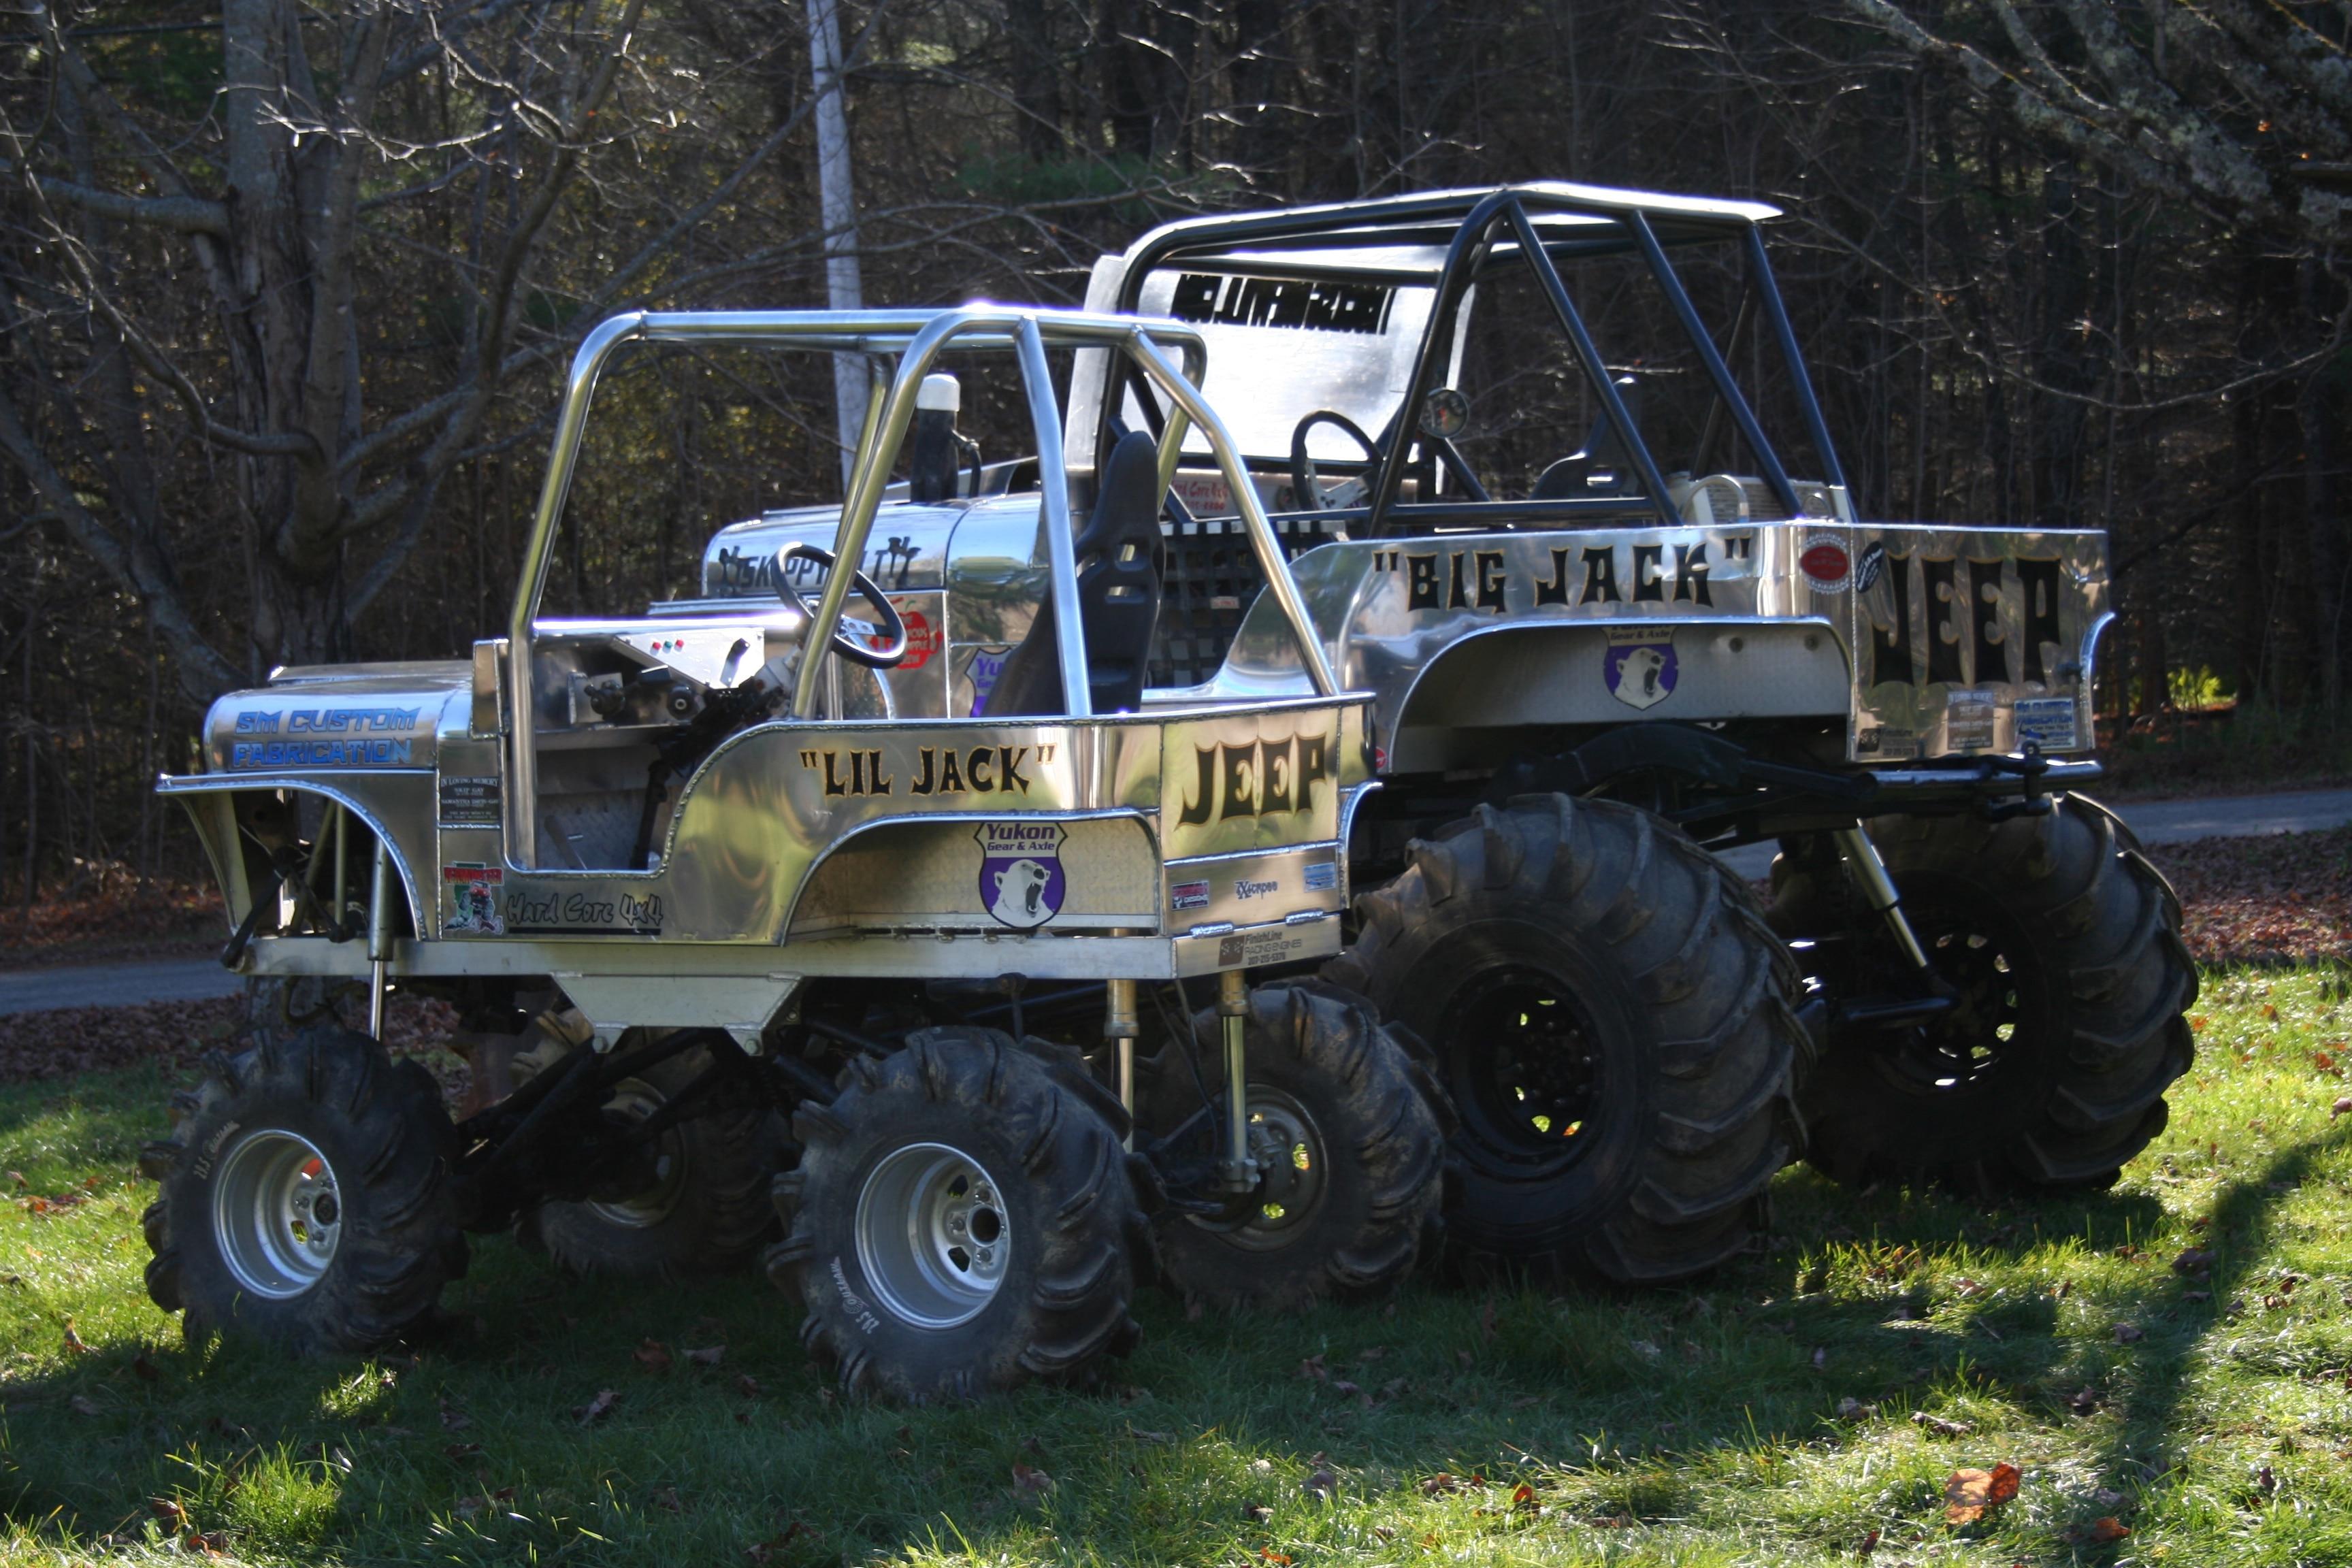 custom willys mud rig big jack and lil jack.JPG